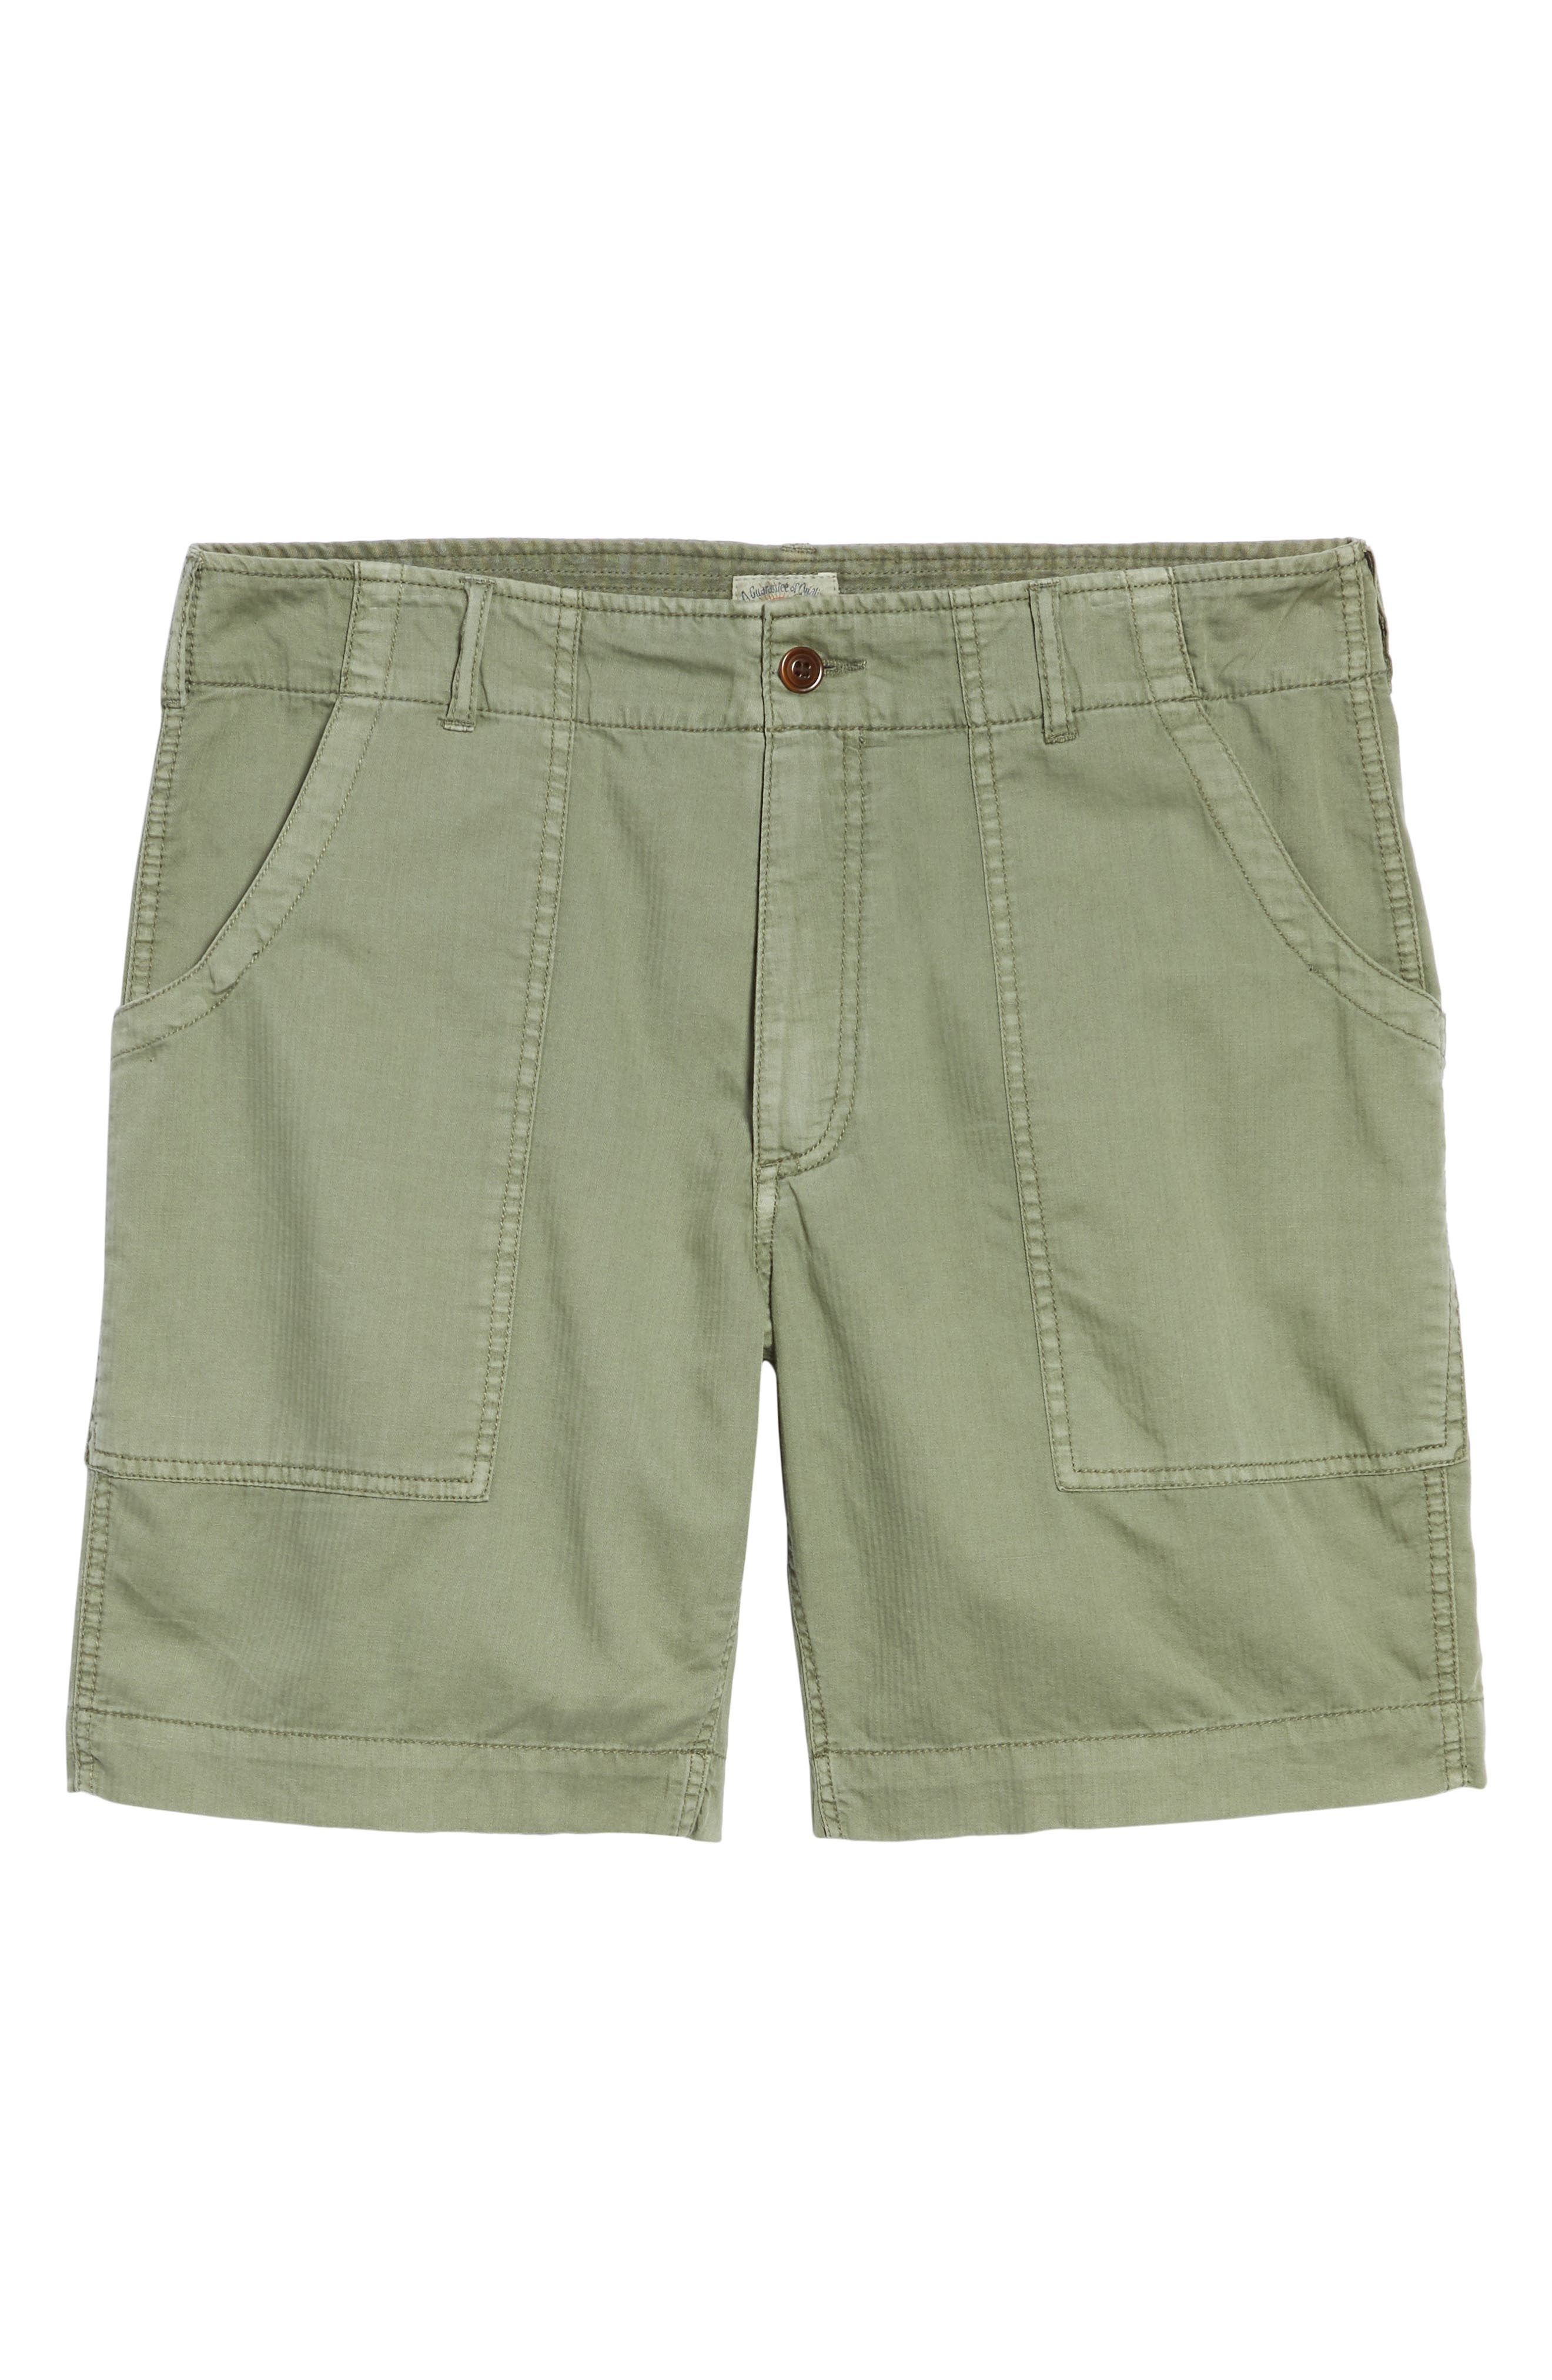 Radar Camp Shorts,                             Alternate thumbnail 6, color,